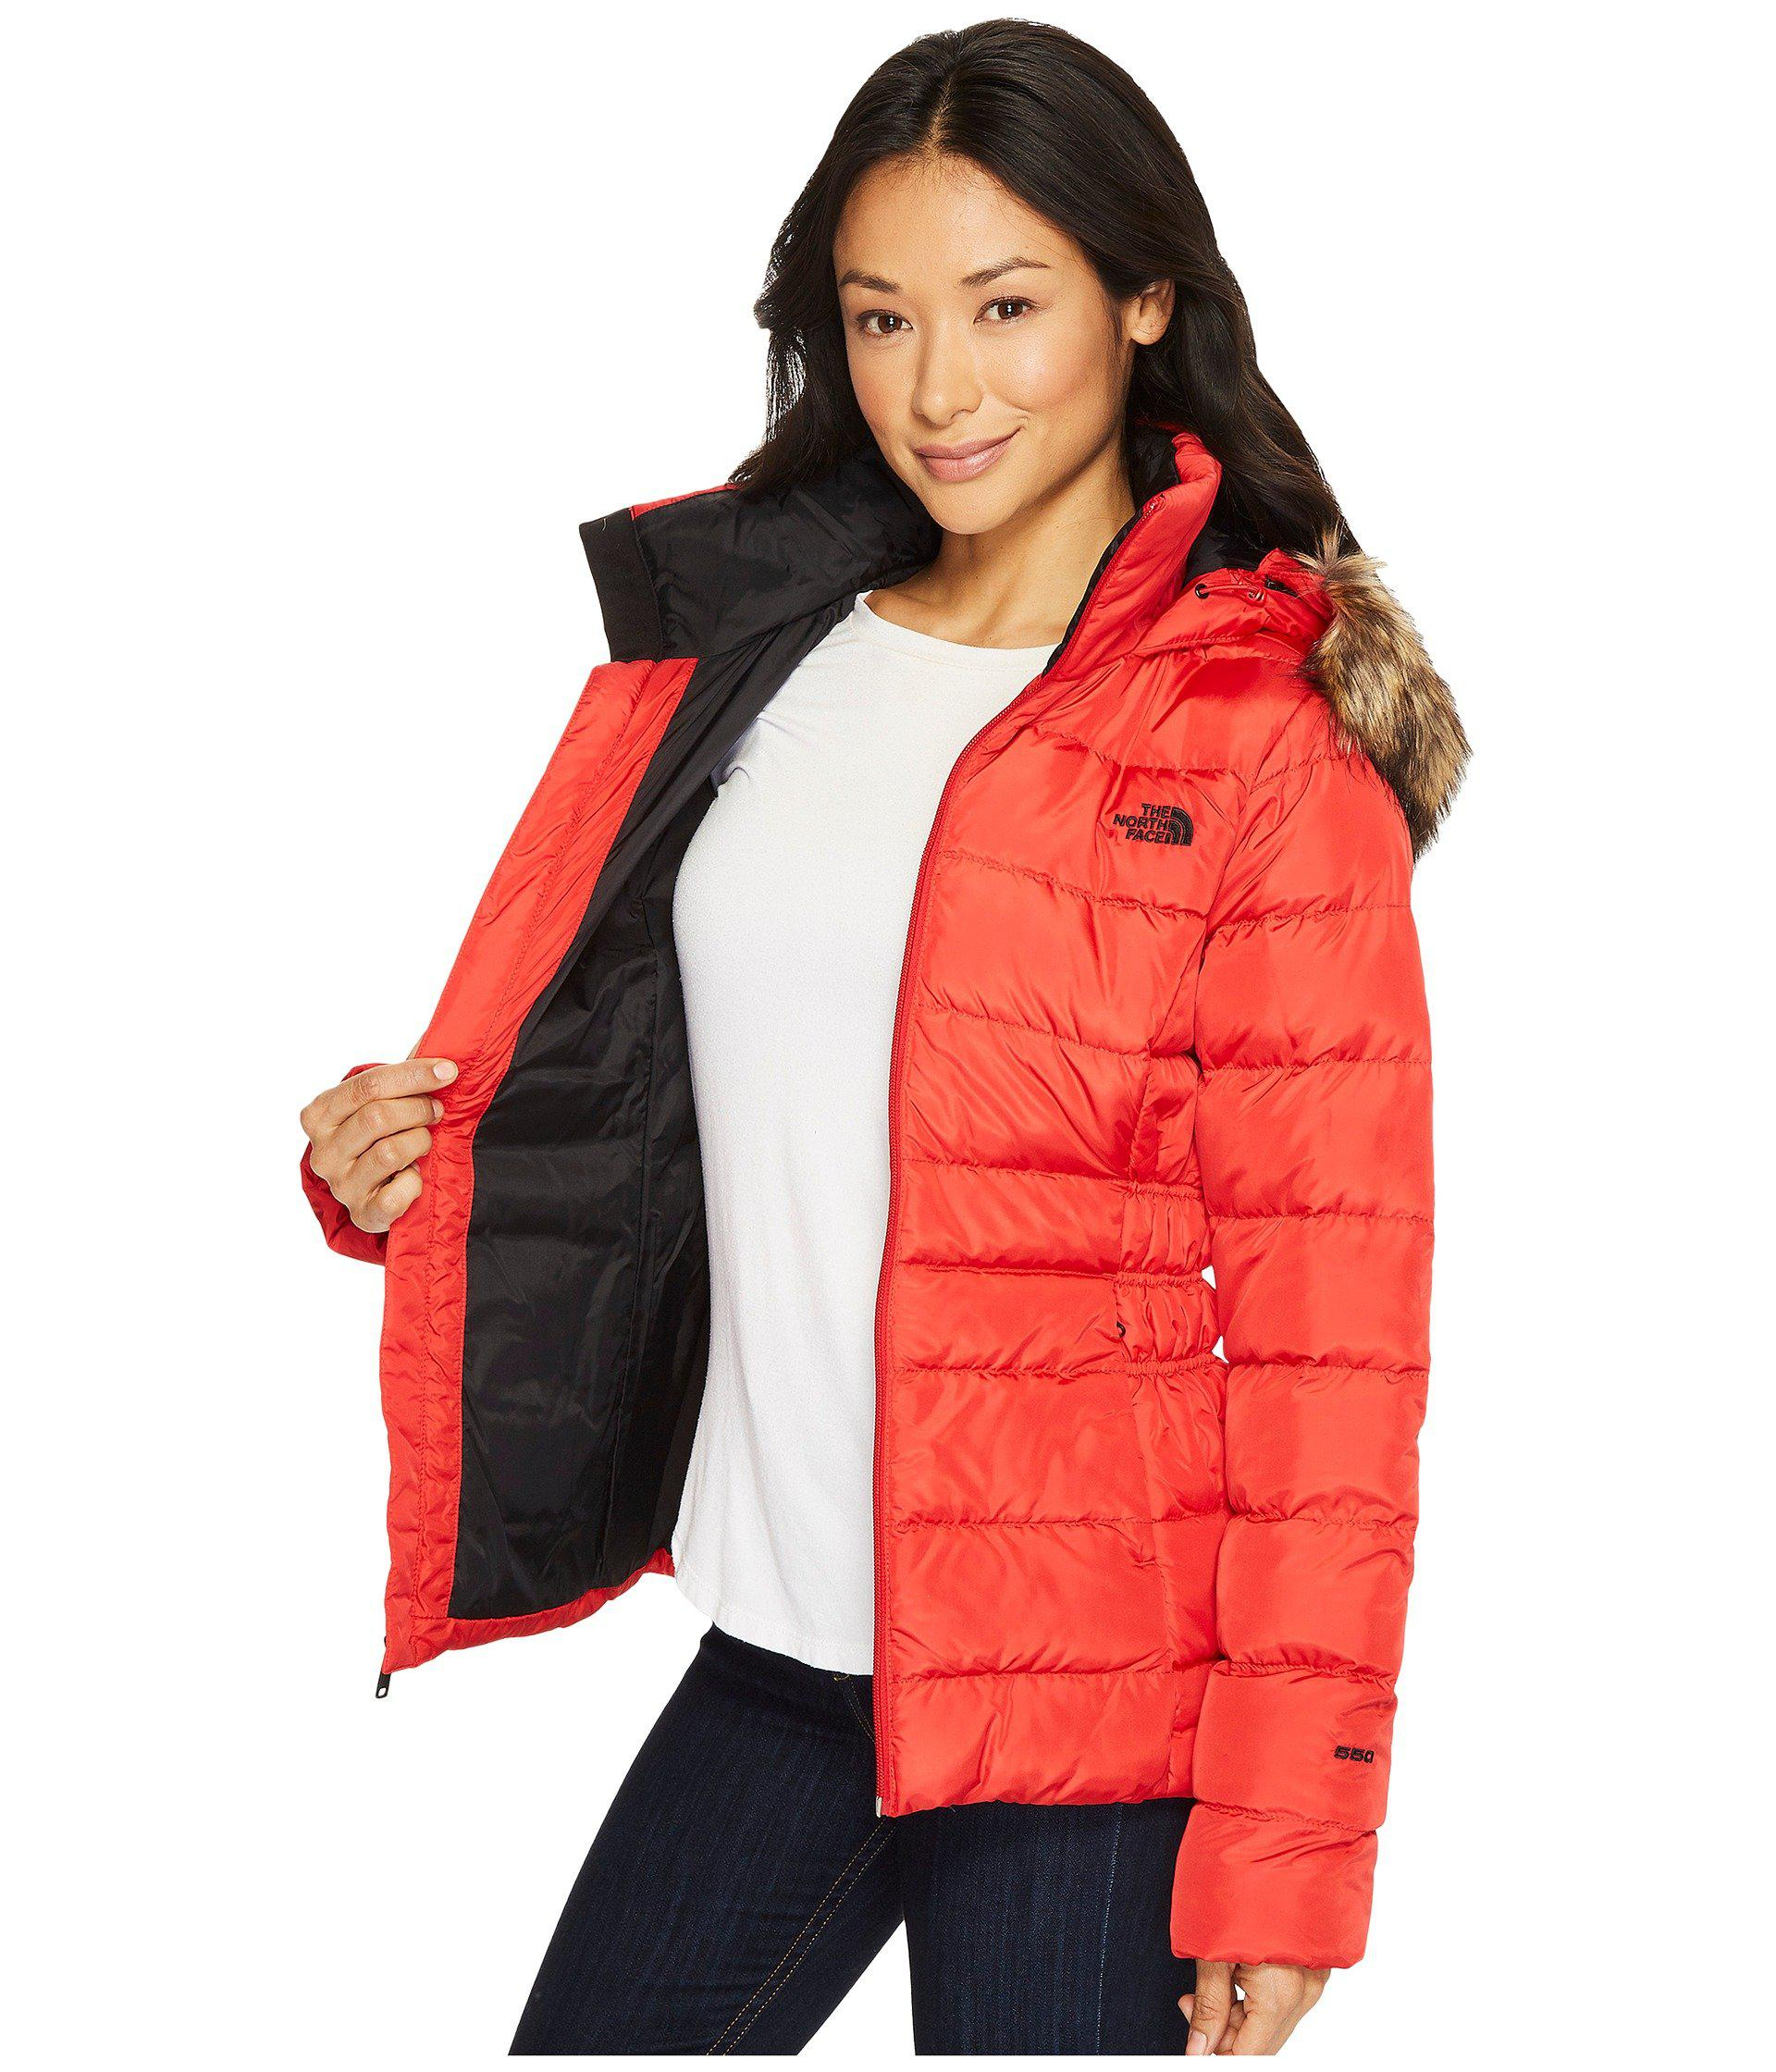 a537e50a4b The North Face - Red Gotham Jacket Ii (metallic Copper) Women s Coat -  Lyst. View fullscreen